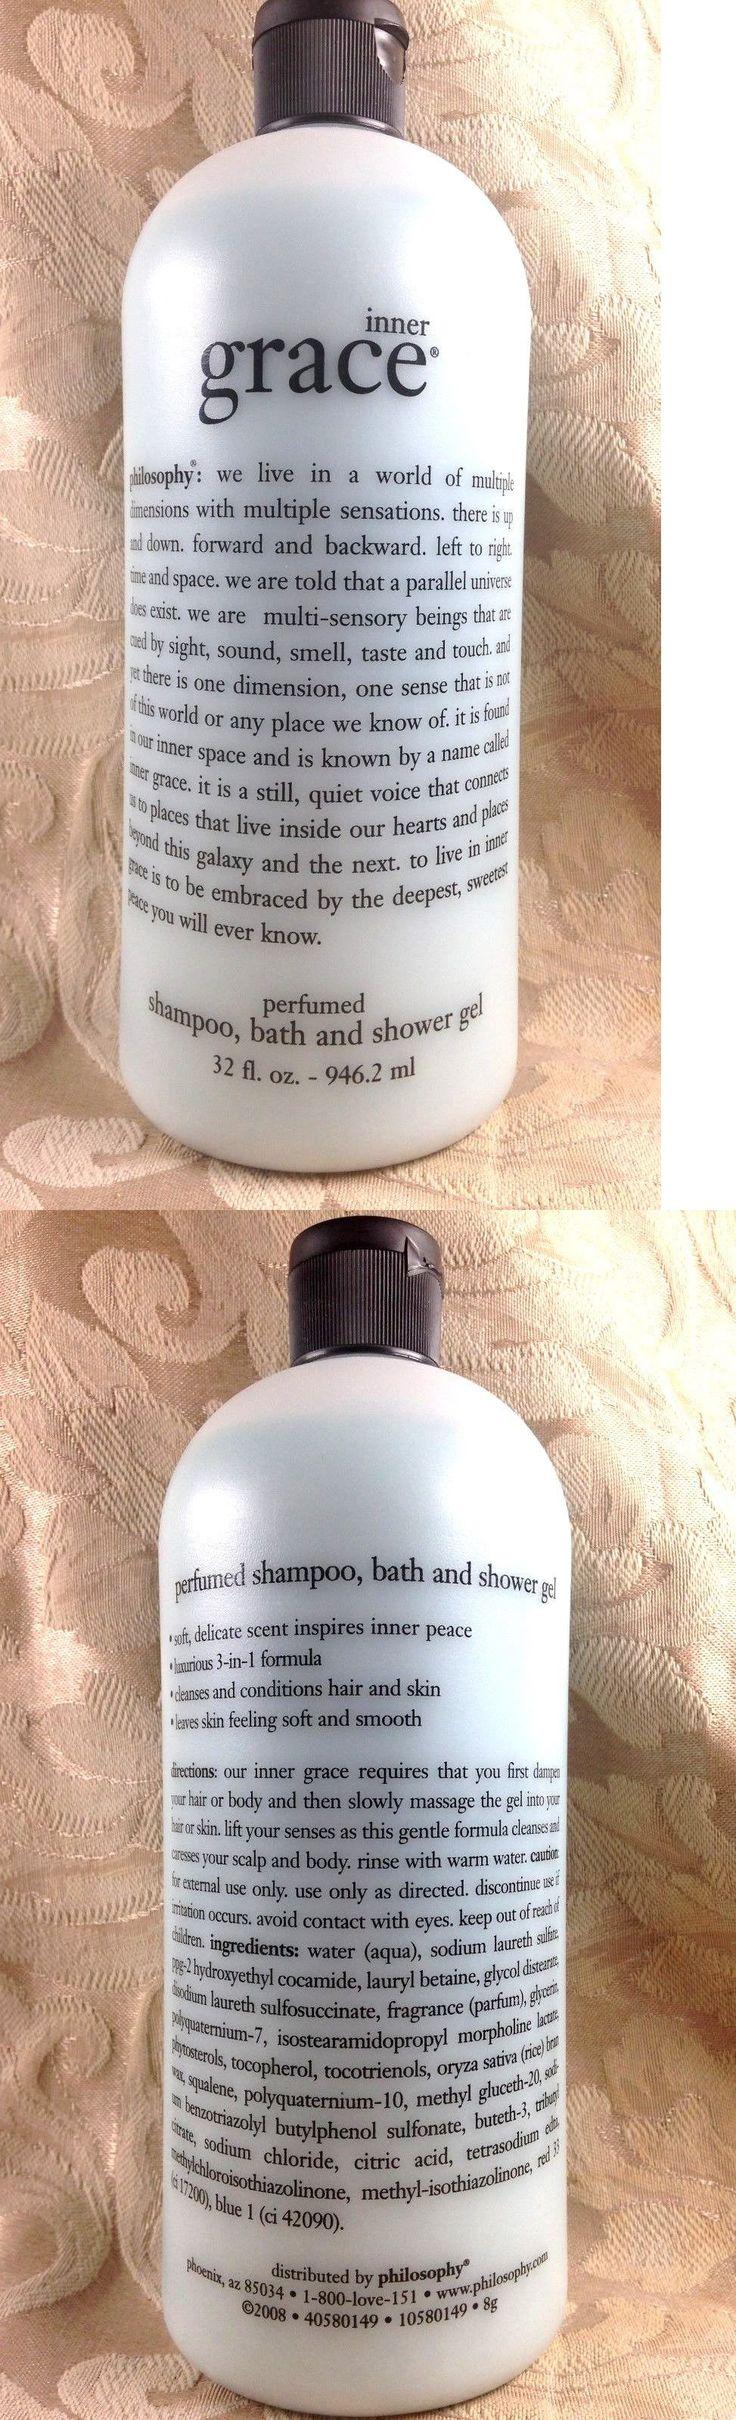 25 melhores ideias de philosophy shower gel no pinterest gel de body washes and shower gels philosophy living grace perfumed shampoo bath and shower